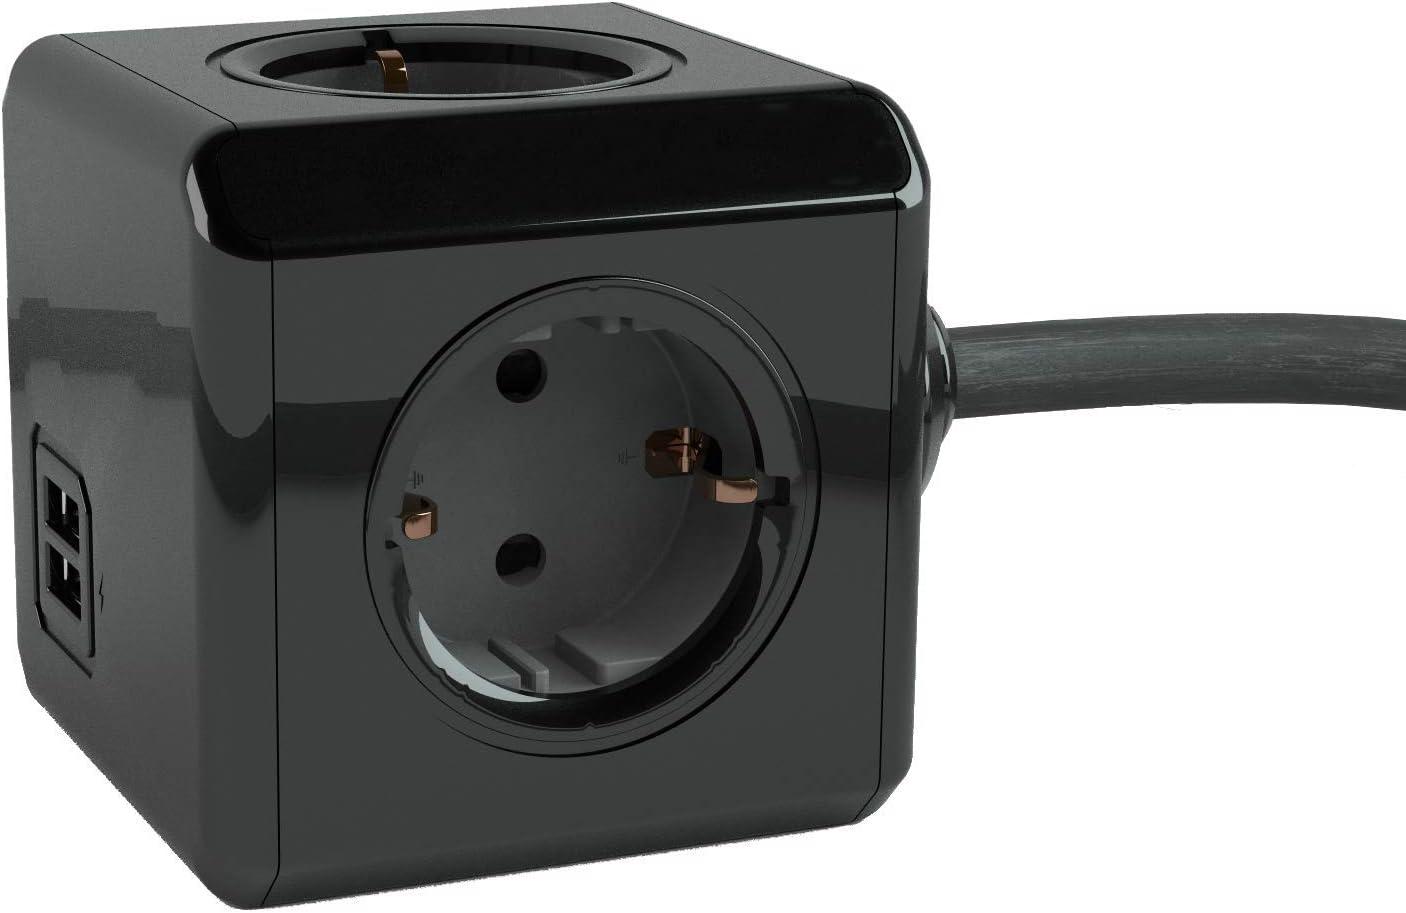 Powercube Schwarze 4er Mehrfachsteckdose Extended Elektronik